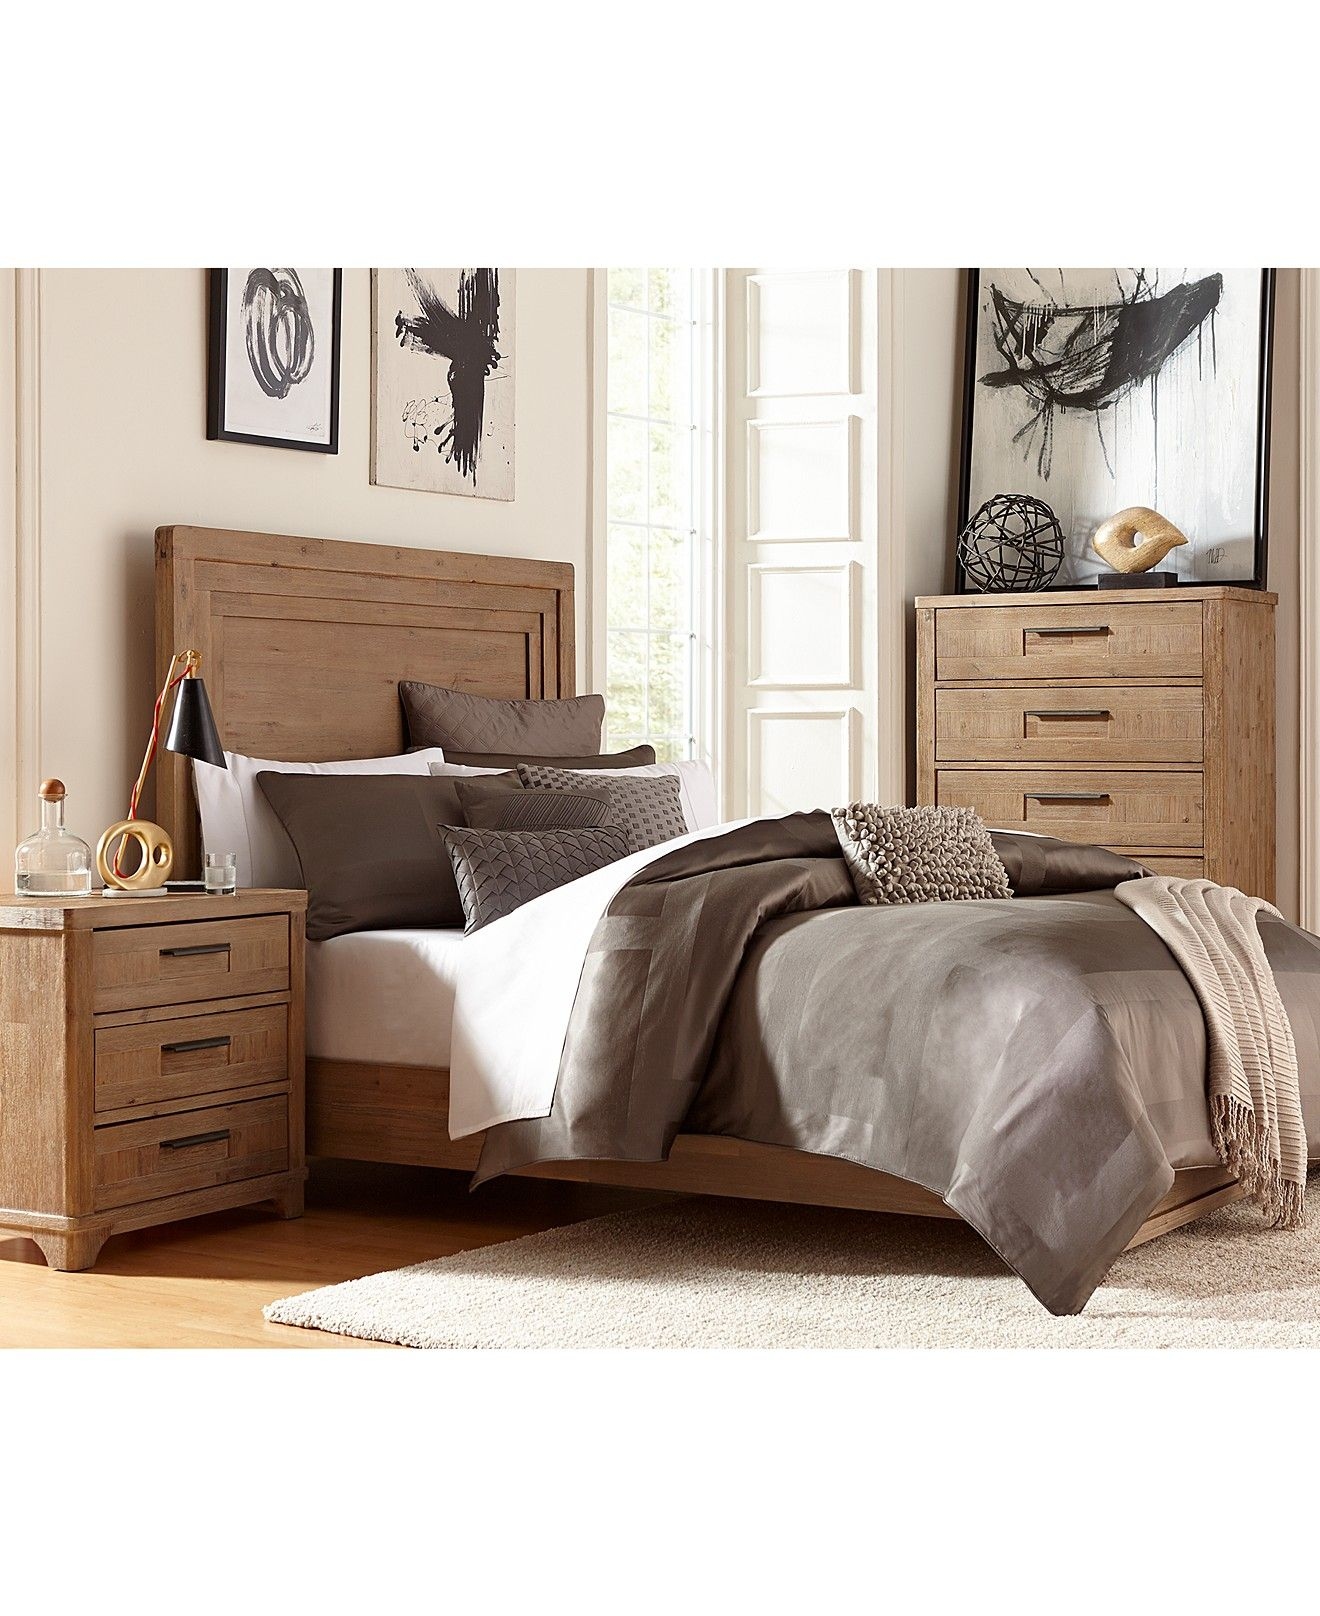 Summerside 3 Piece Queen Bedroom Furniture Set with Chest - Shop All ...